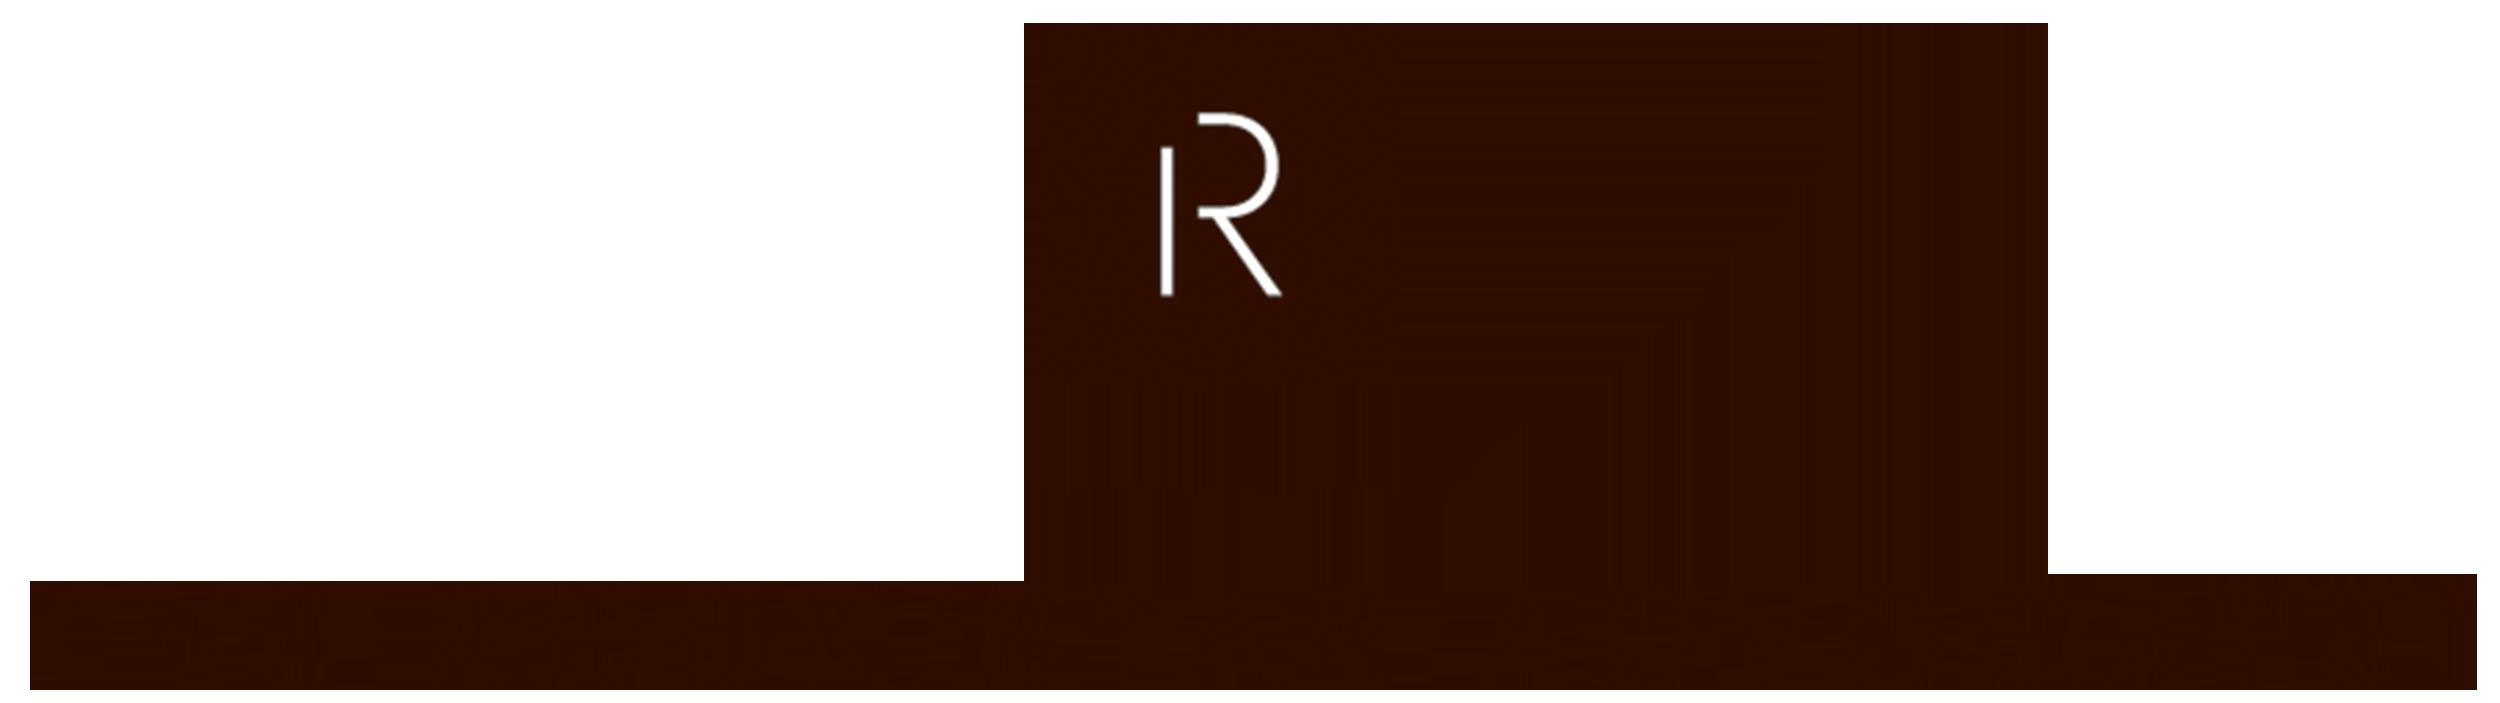 THE ROCK/STAR ADVOCATE